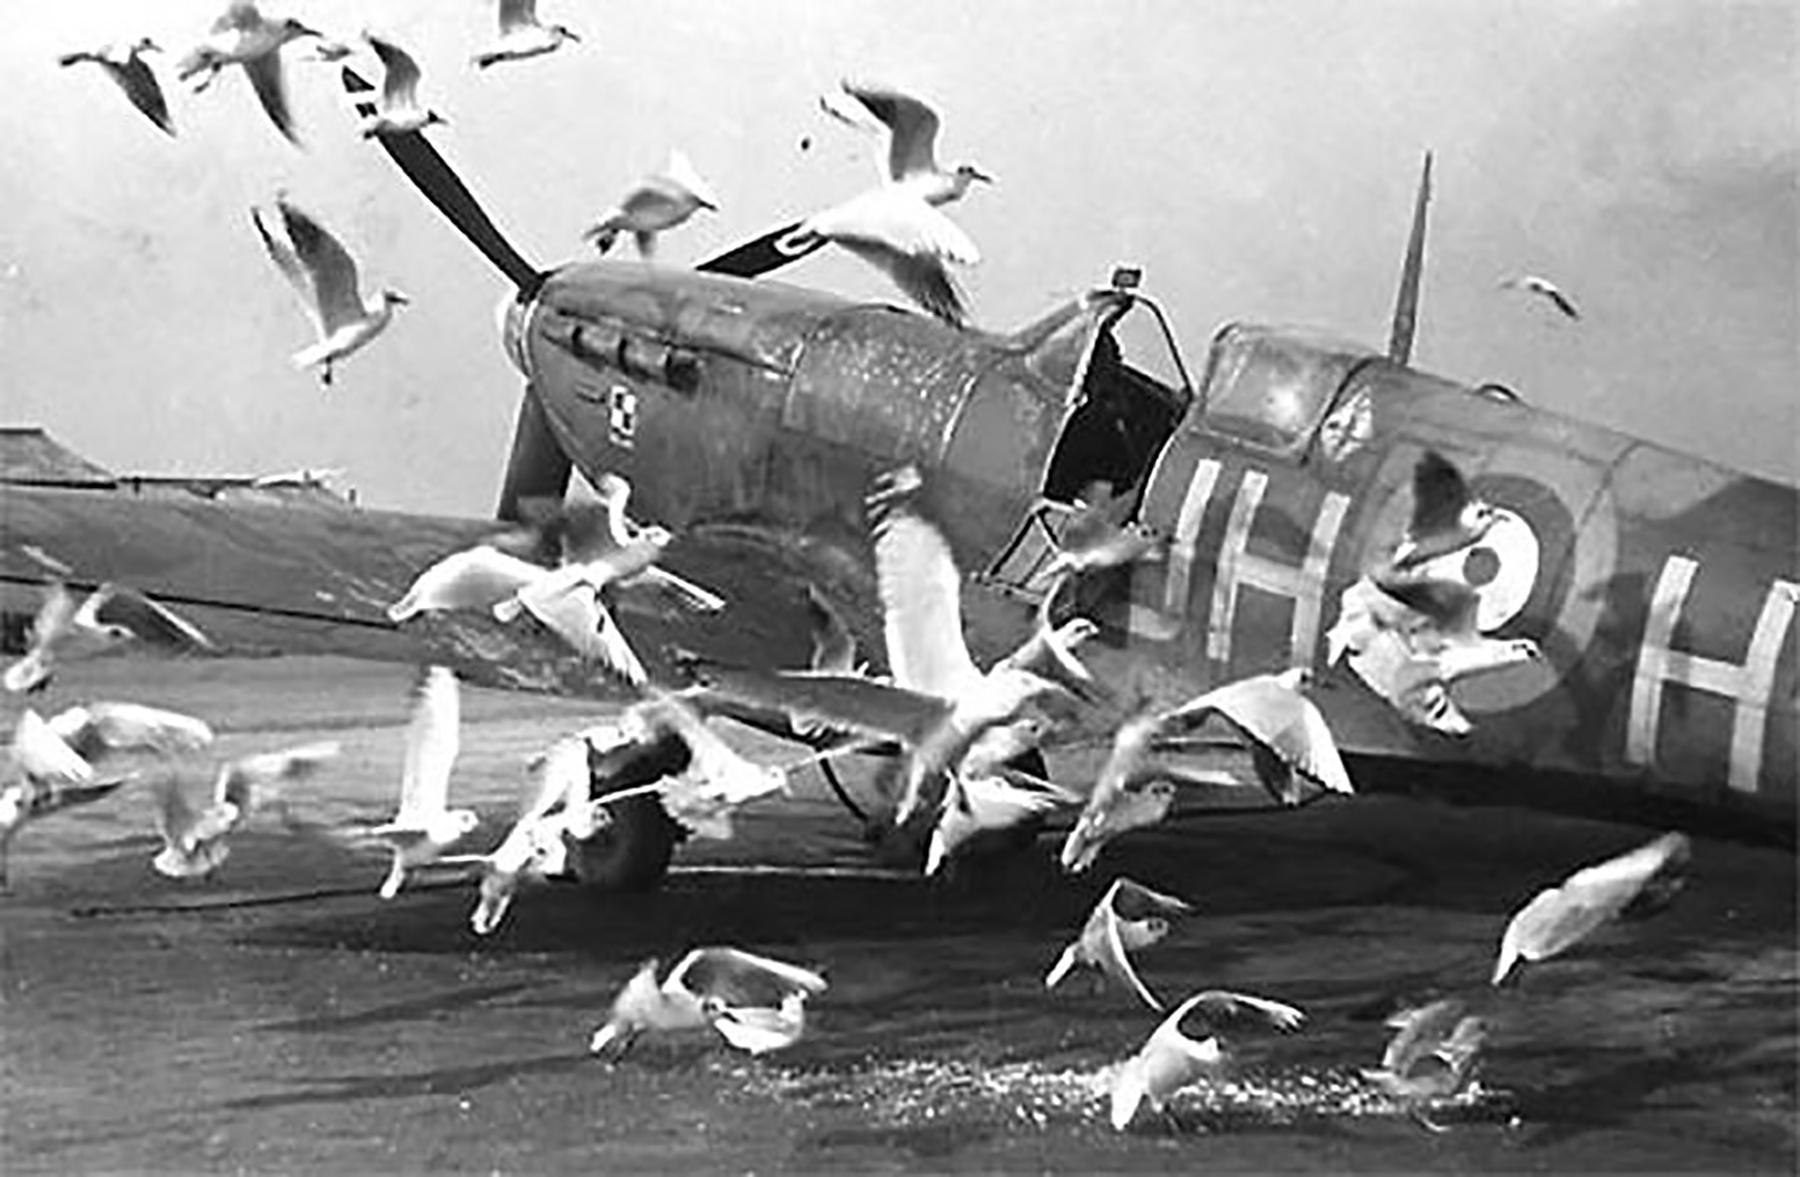 Spitfire MkVb RAF 317Sqn JHH PO Bochniak surrounded by seagulls AD140 Northolt 01